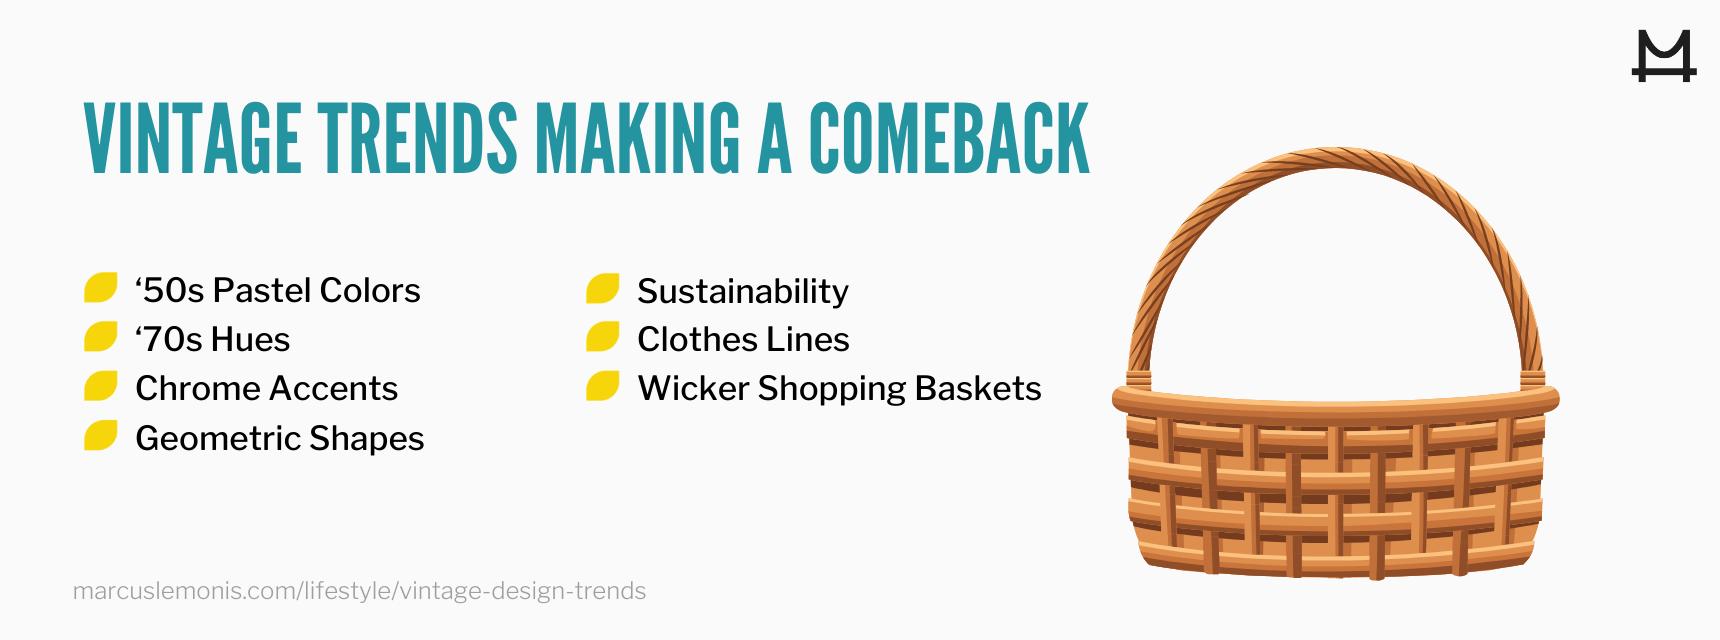 List of vintage trends making a comeback.